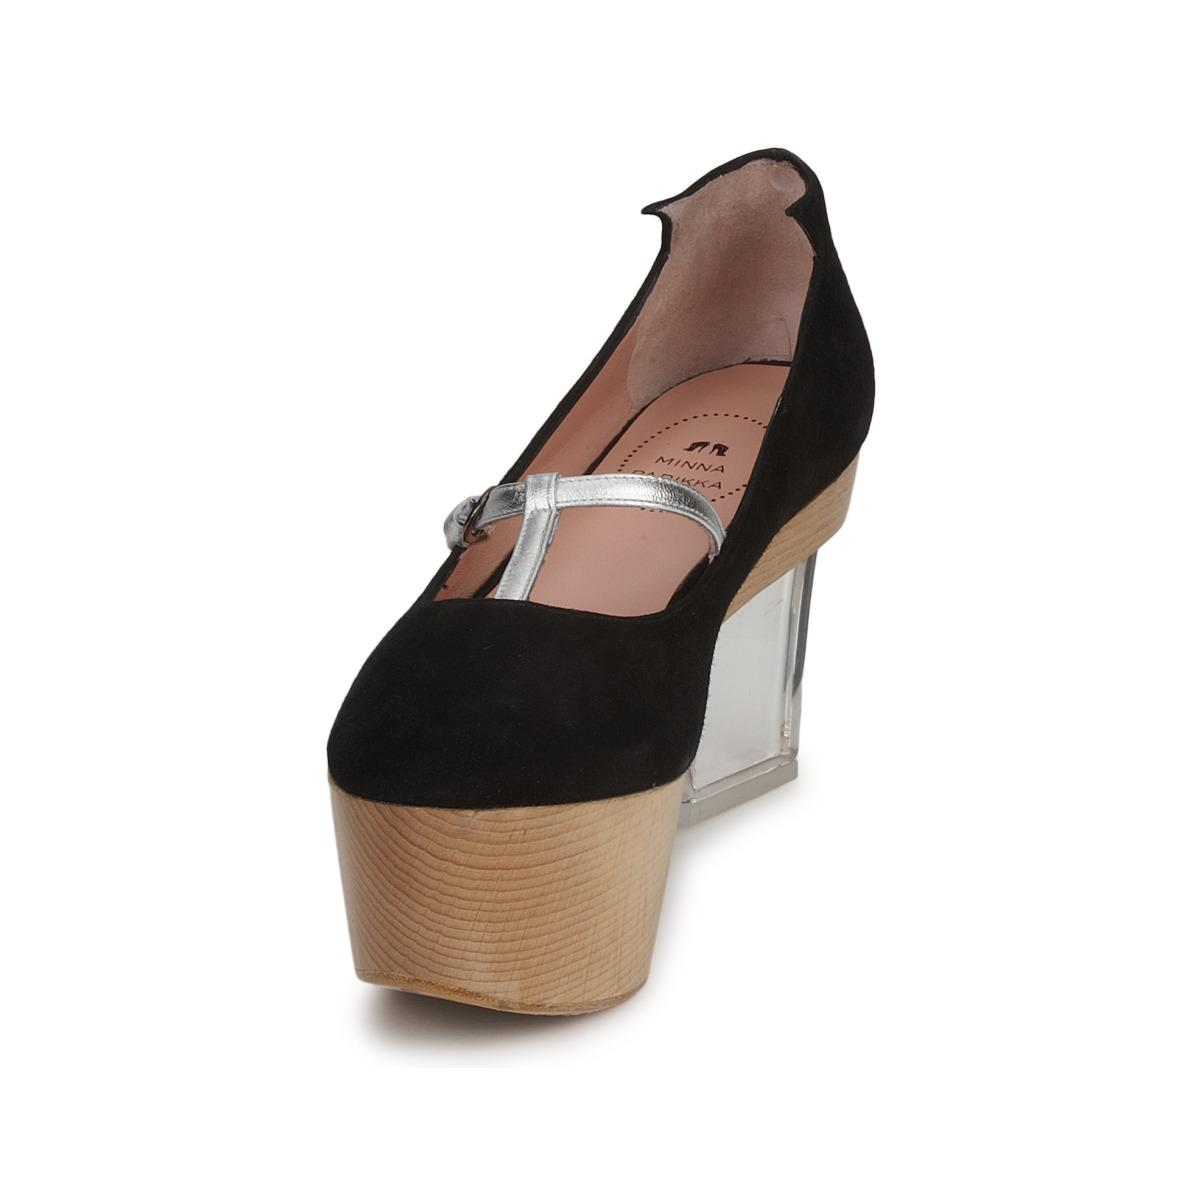 803daccbd8 Minna Parikka - Tbc Women s Court Shoes In Black - Lyst. View fullscreen